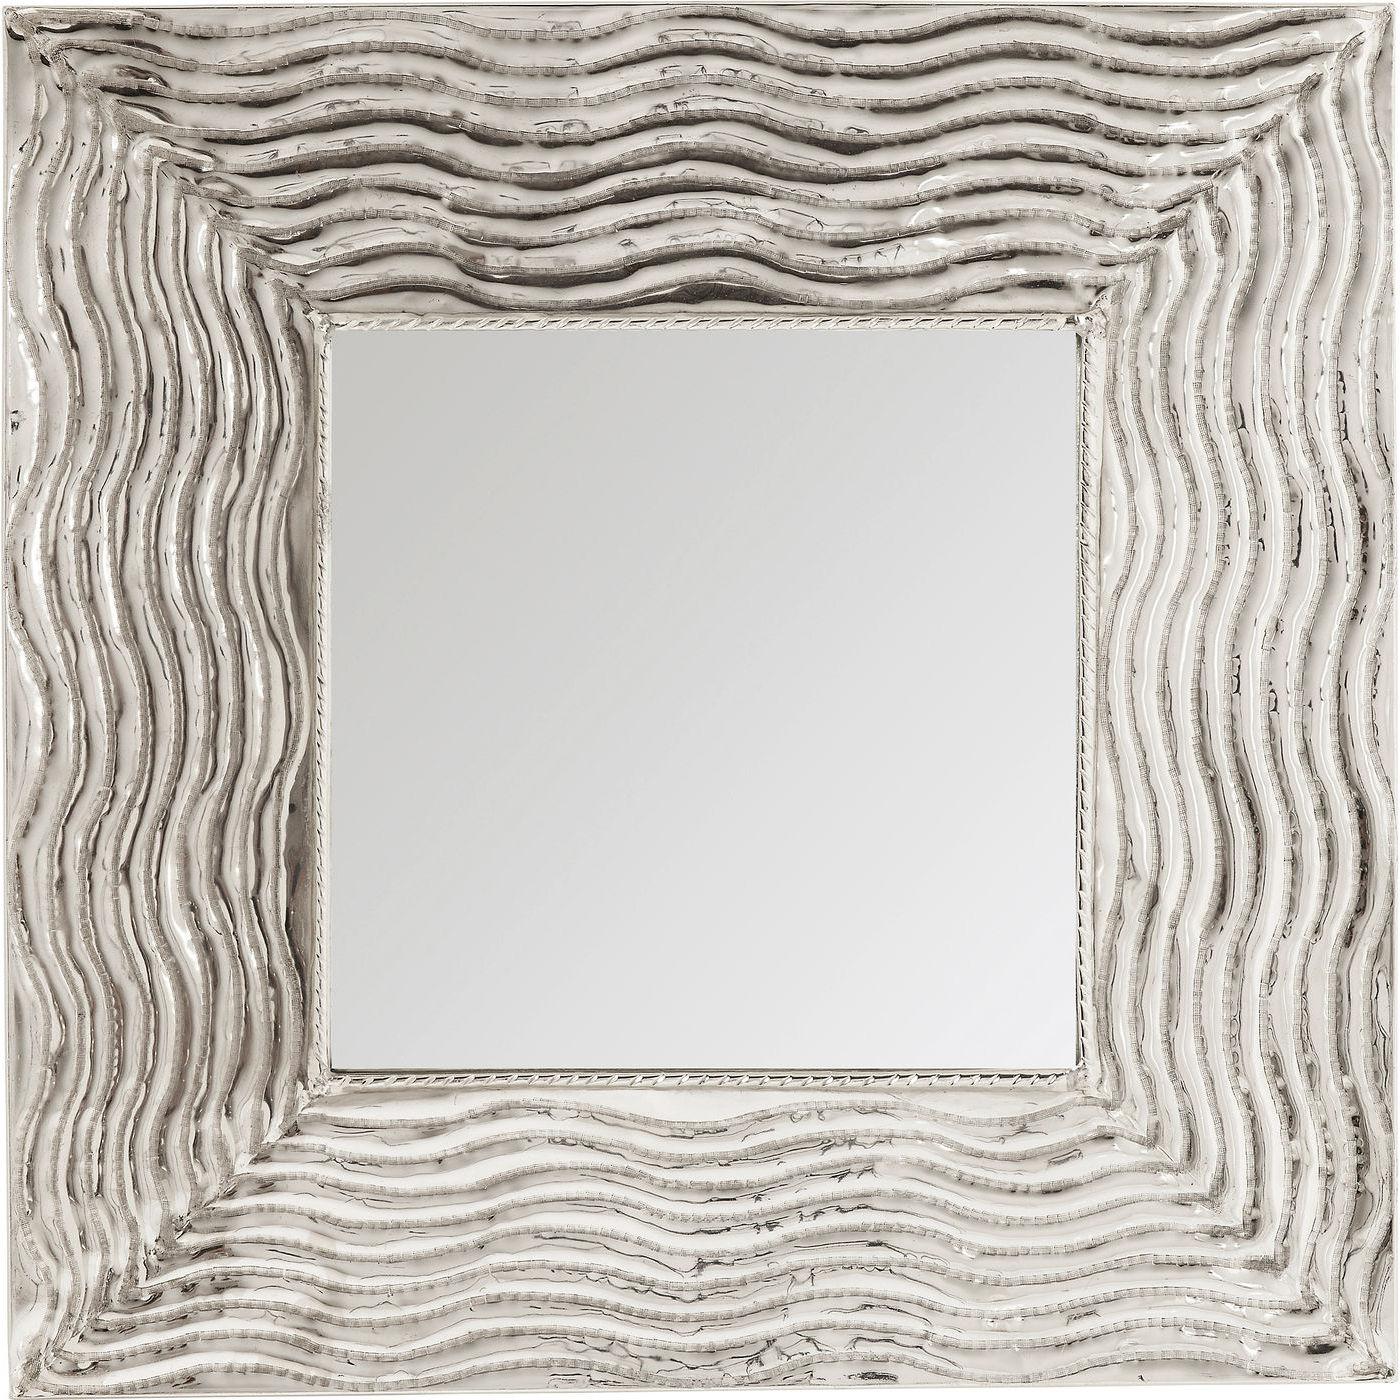 kare design – Kare design pluto xxl vægspejl - spejlglas/sølv aluminium, kvadratisk (108x108) fra boboonline.dk